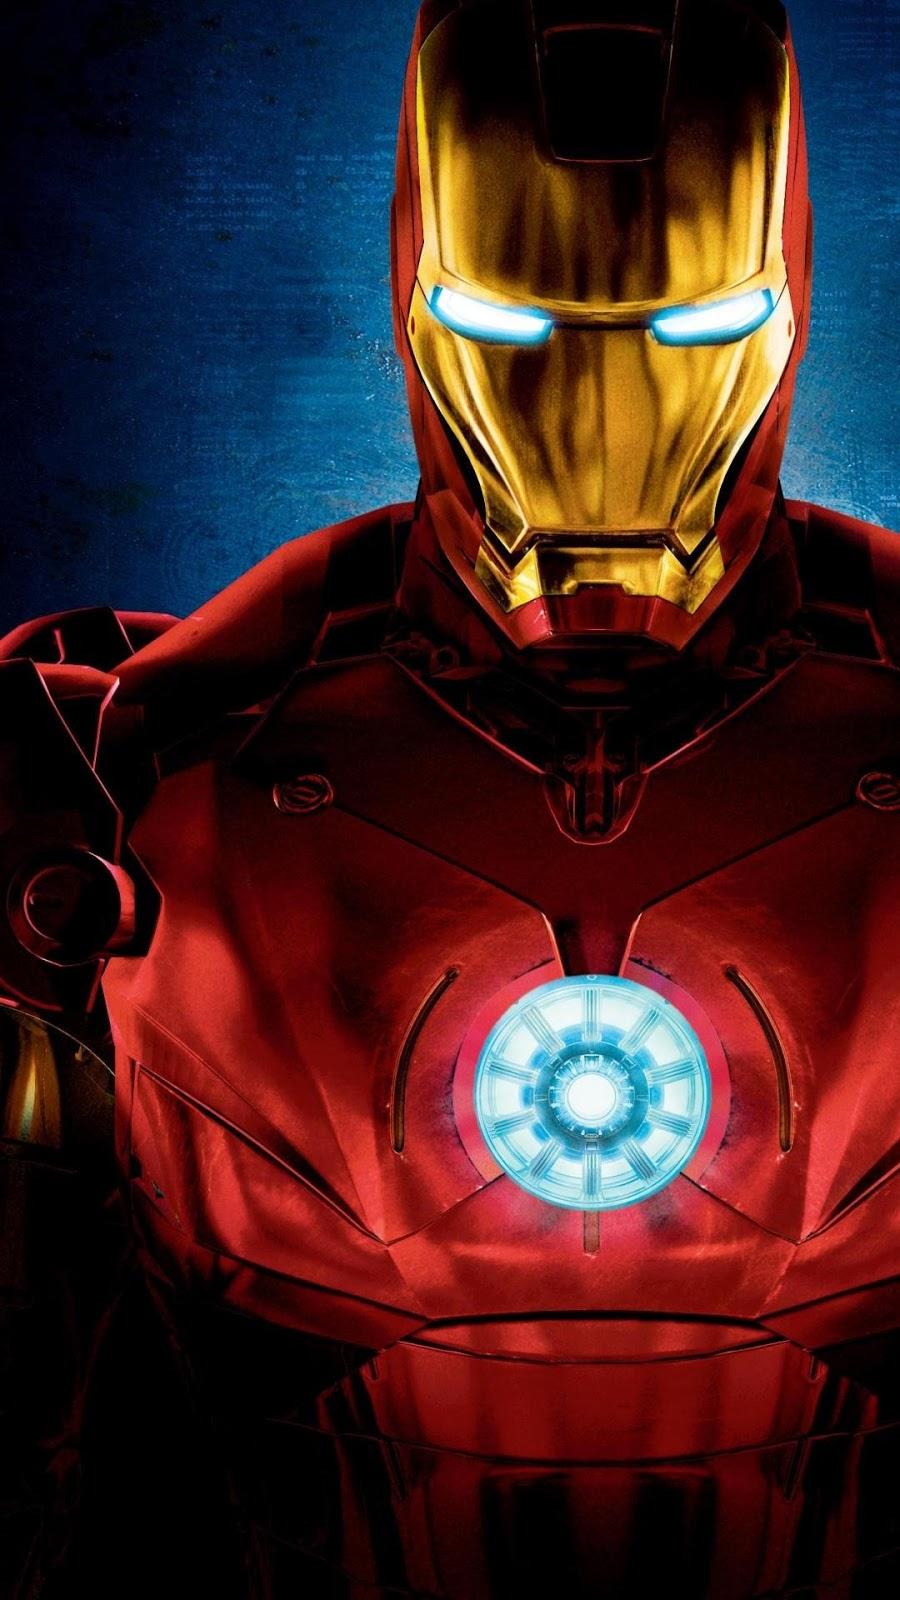 iron man images download